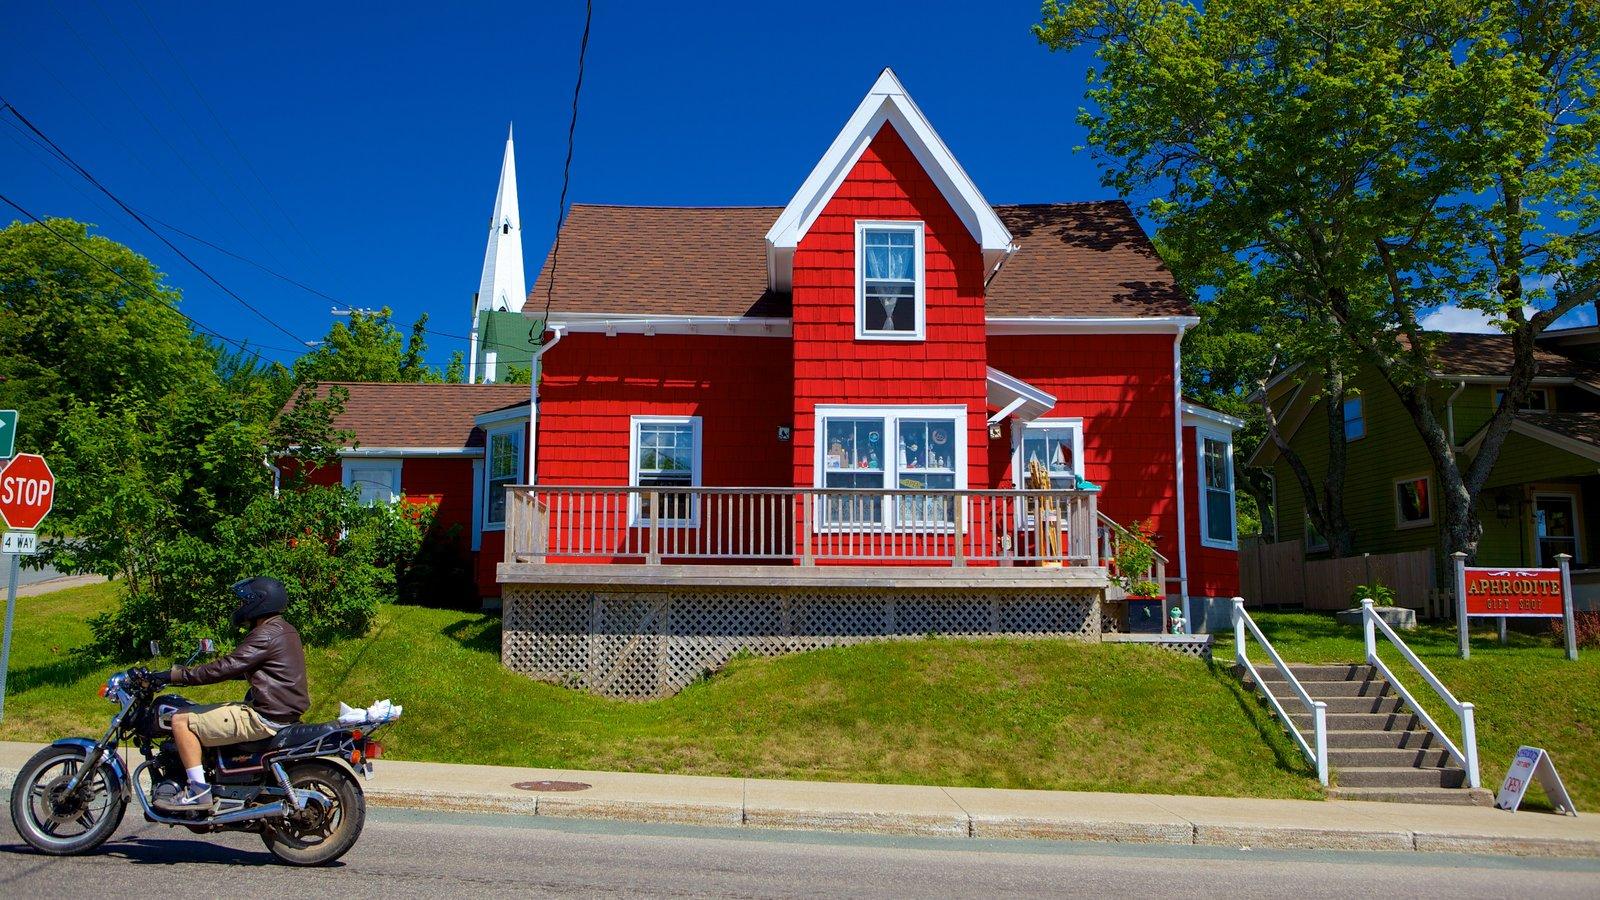 Baddeck caracterizando cenas de rua e uma casa